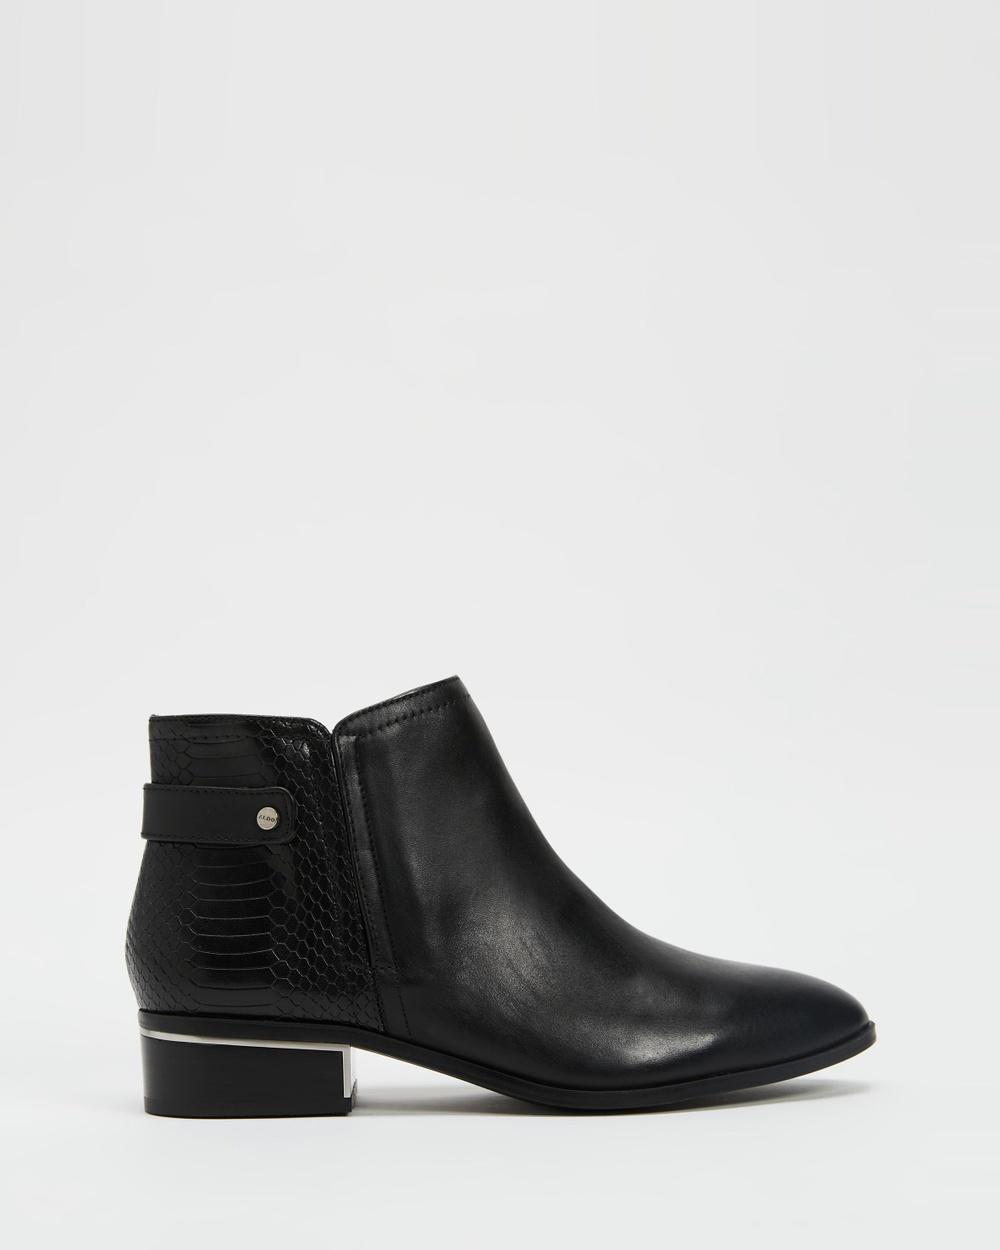 ALDO Jeraelle Ankle Boots Black